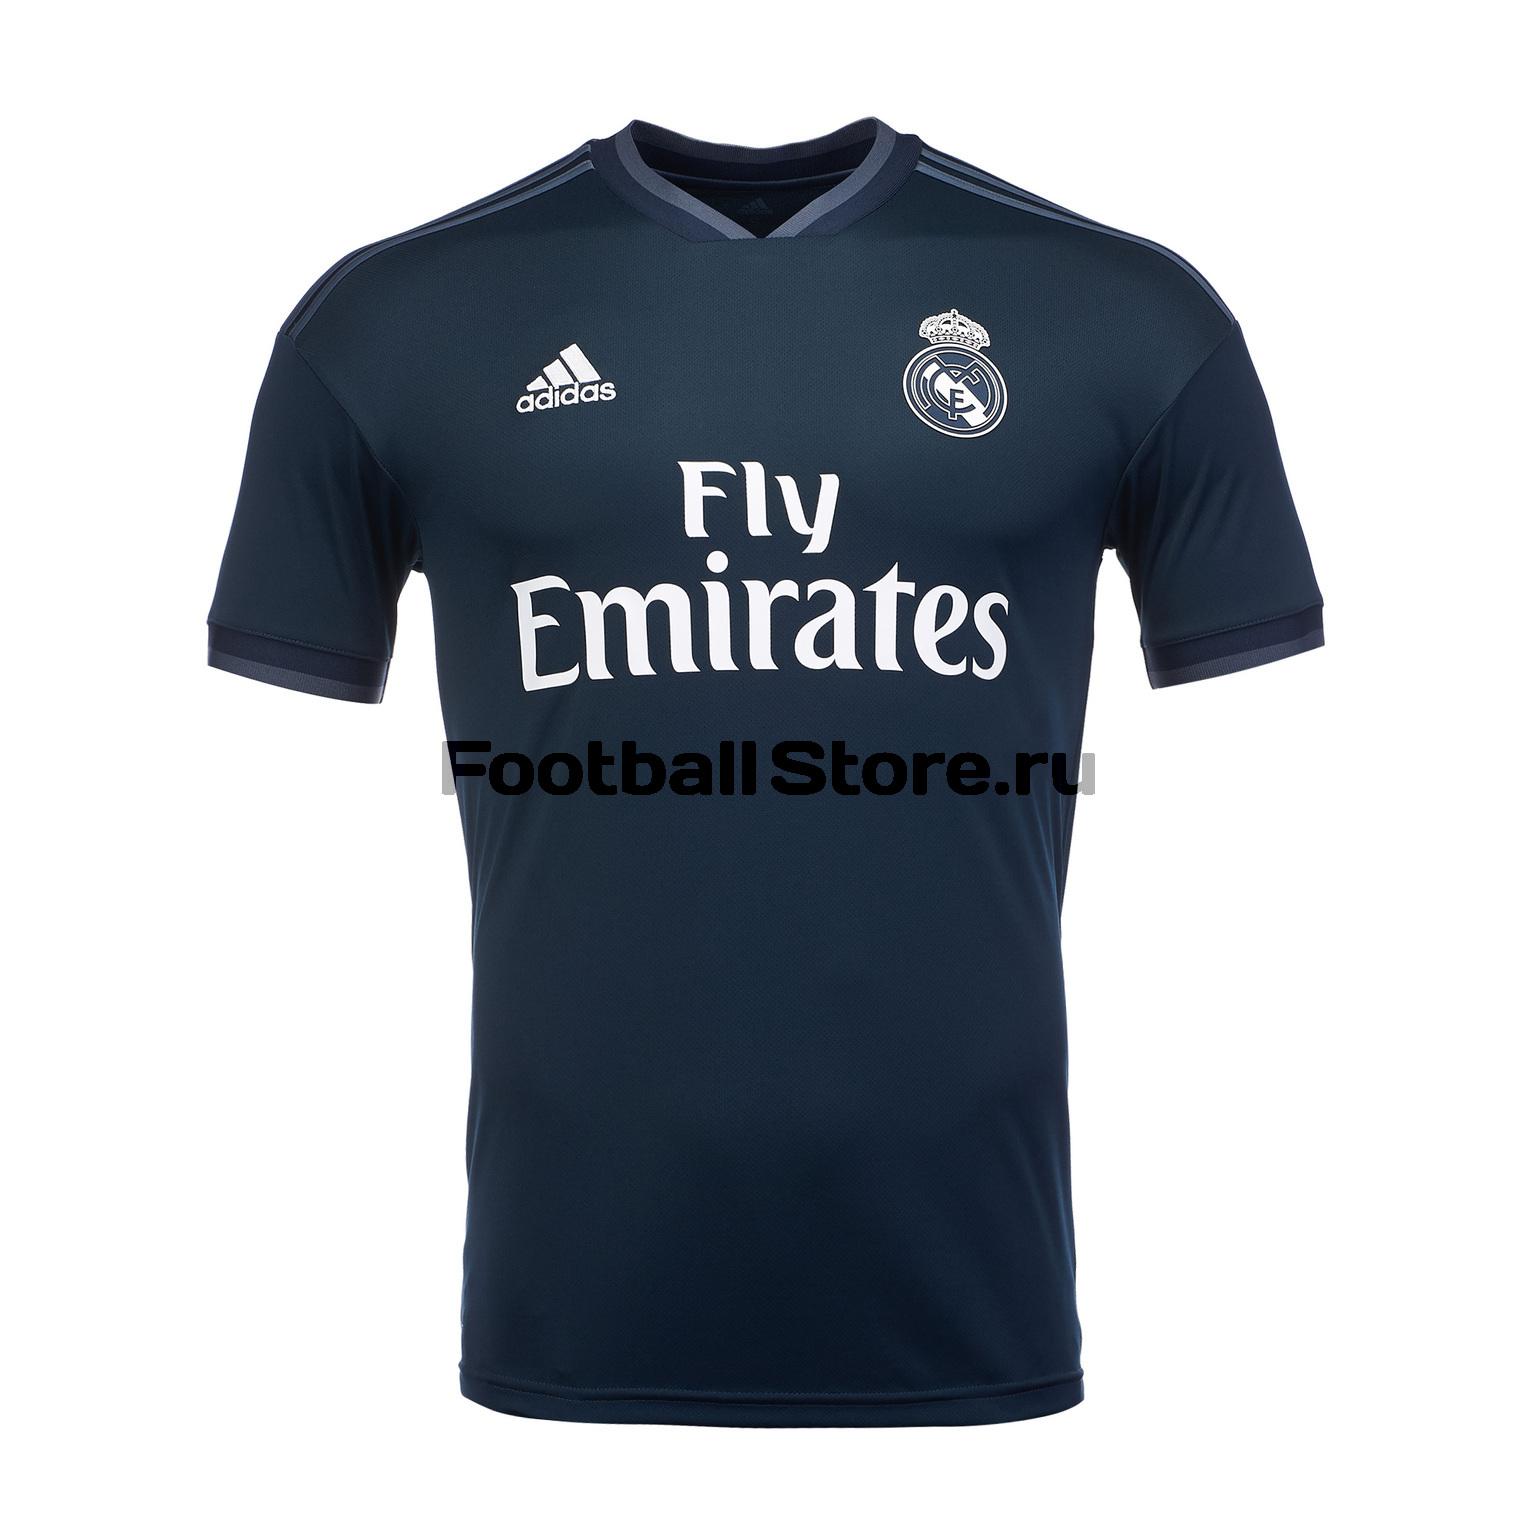 Футболка выездная игровая Adidas Real Madrid 2018/19 игровая выездная футболка цвет белый размер l